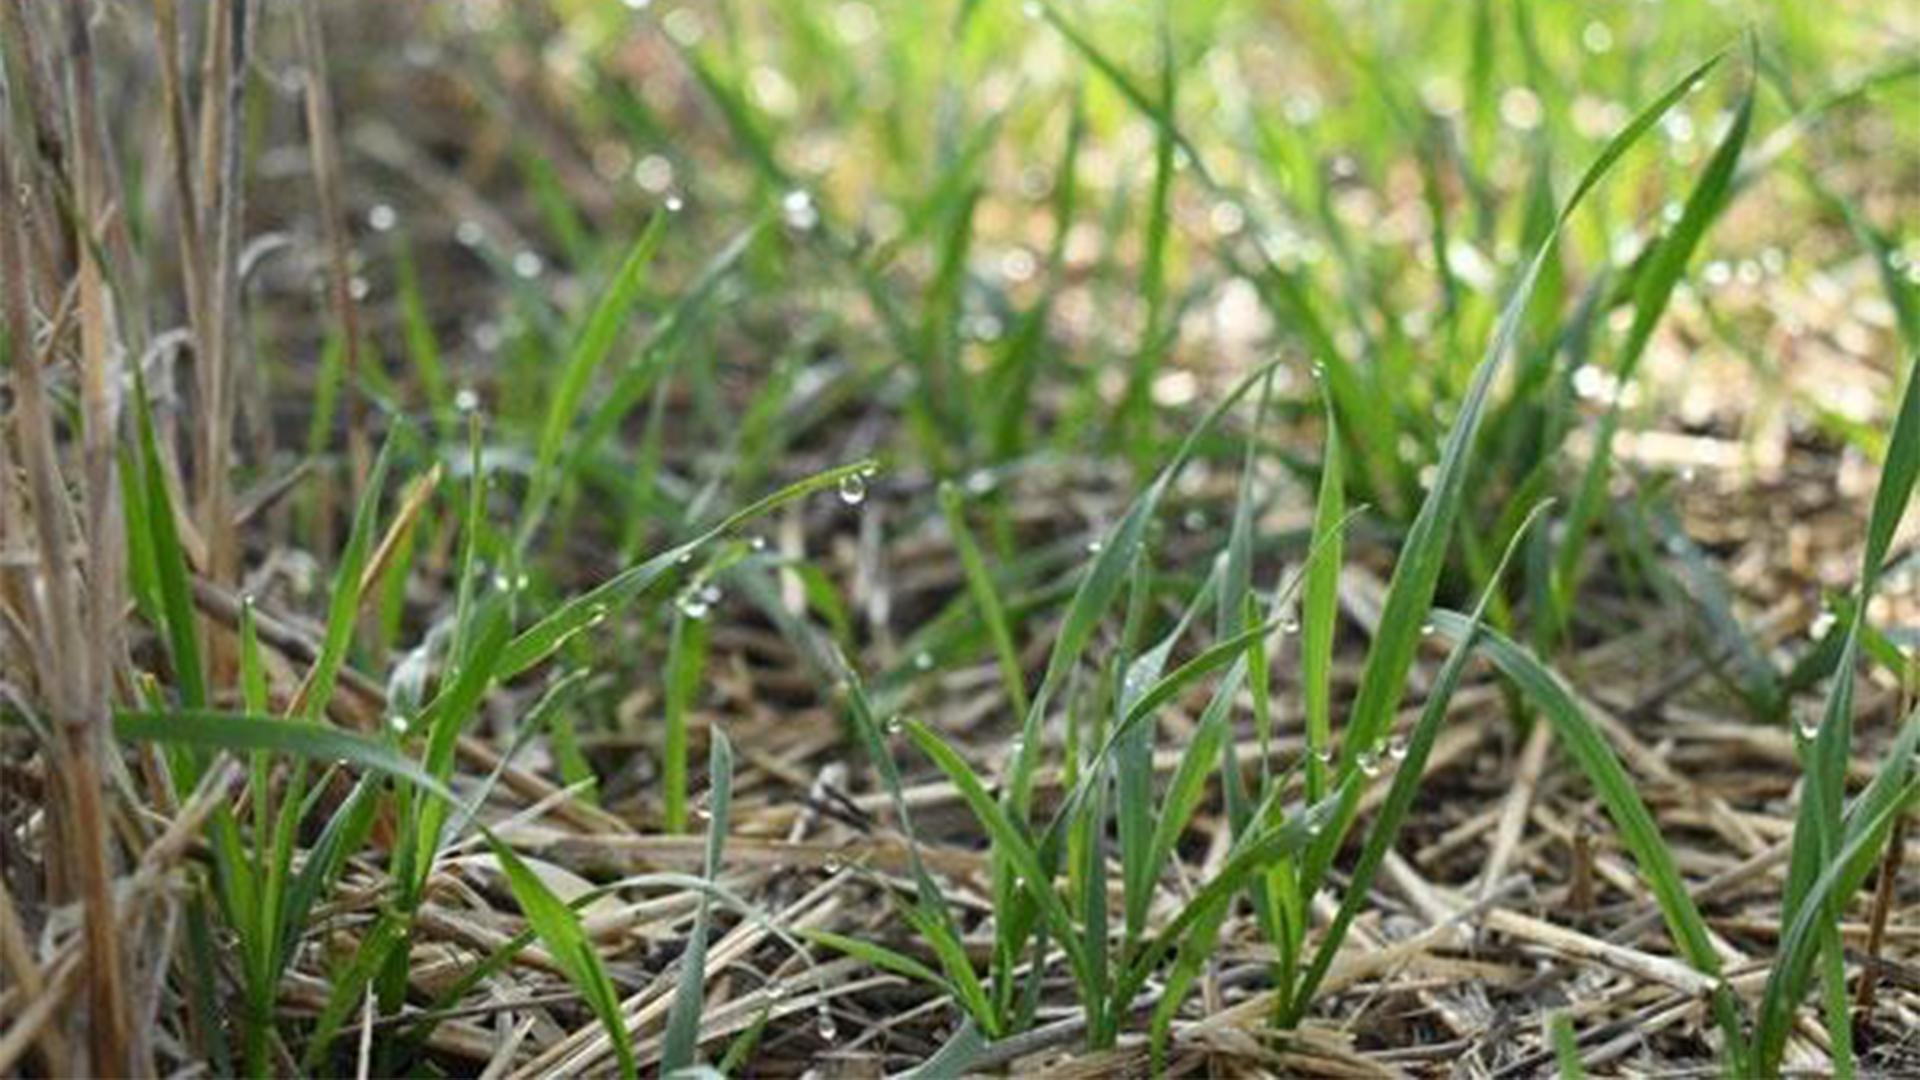 Wheat streak mosaic virus